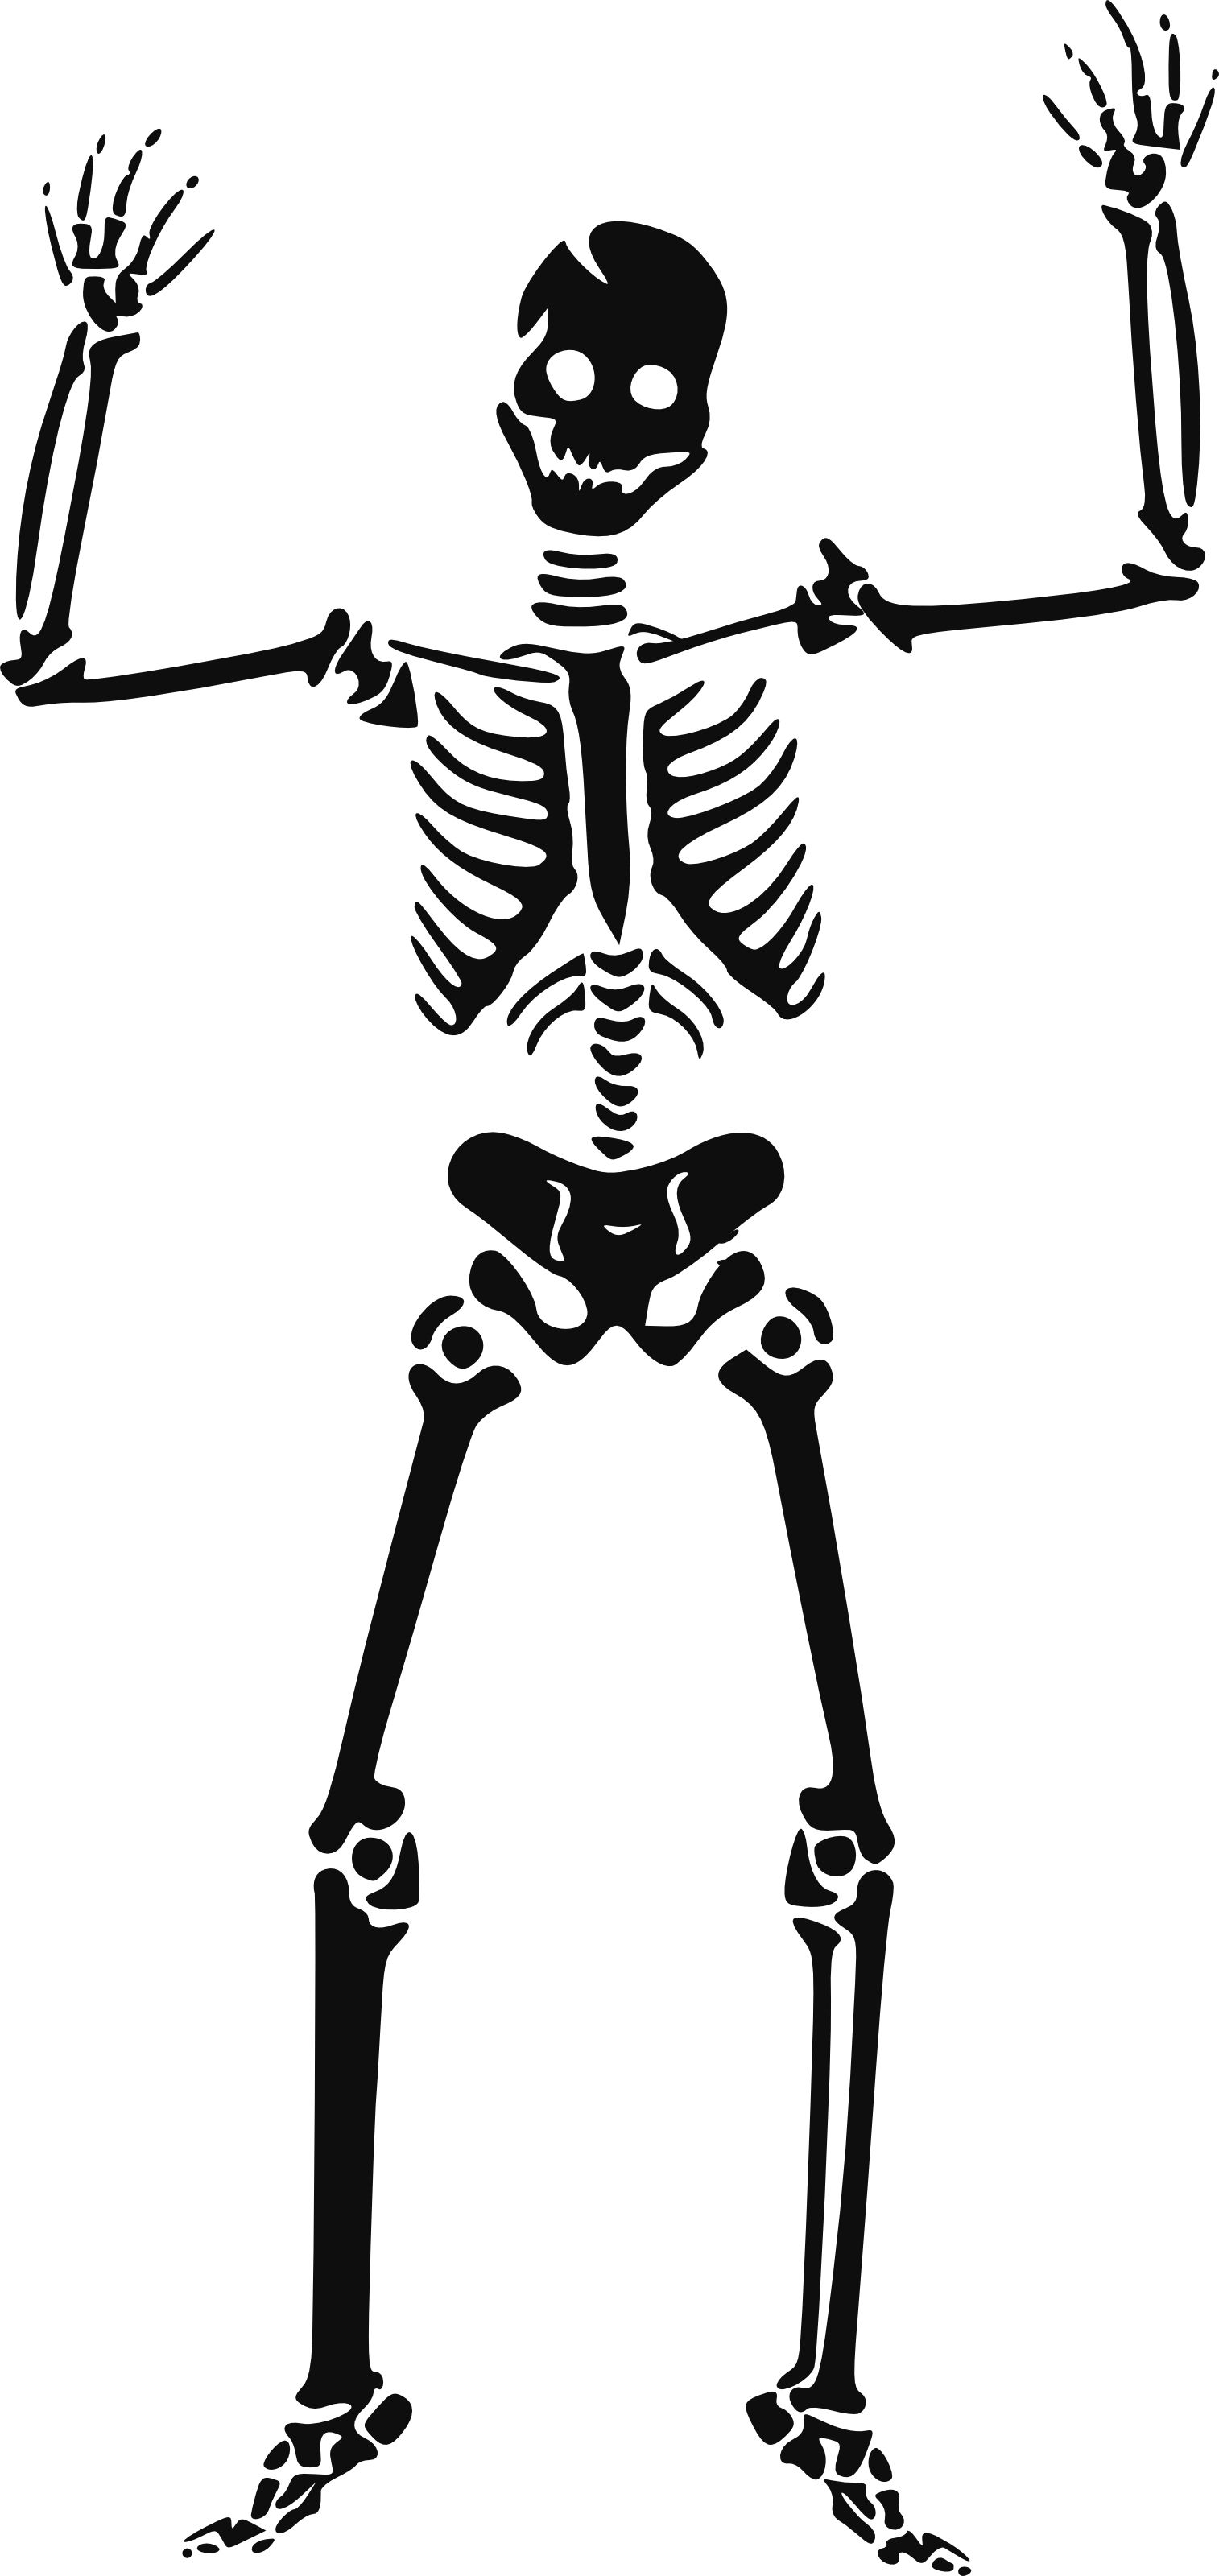 hight resolution of 117 happy skeleton free halloween vector clipart illustration